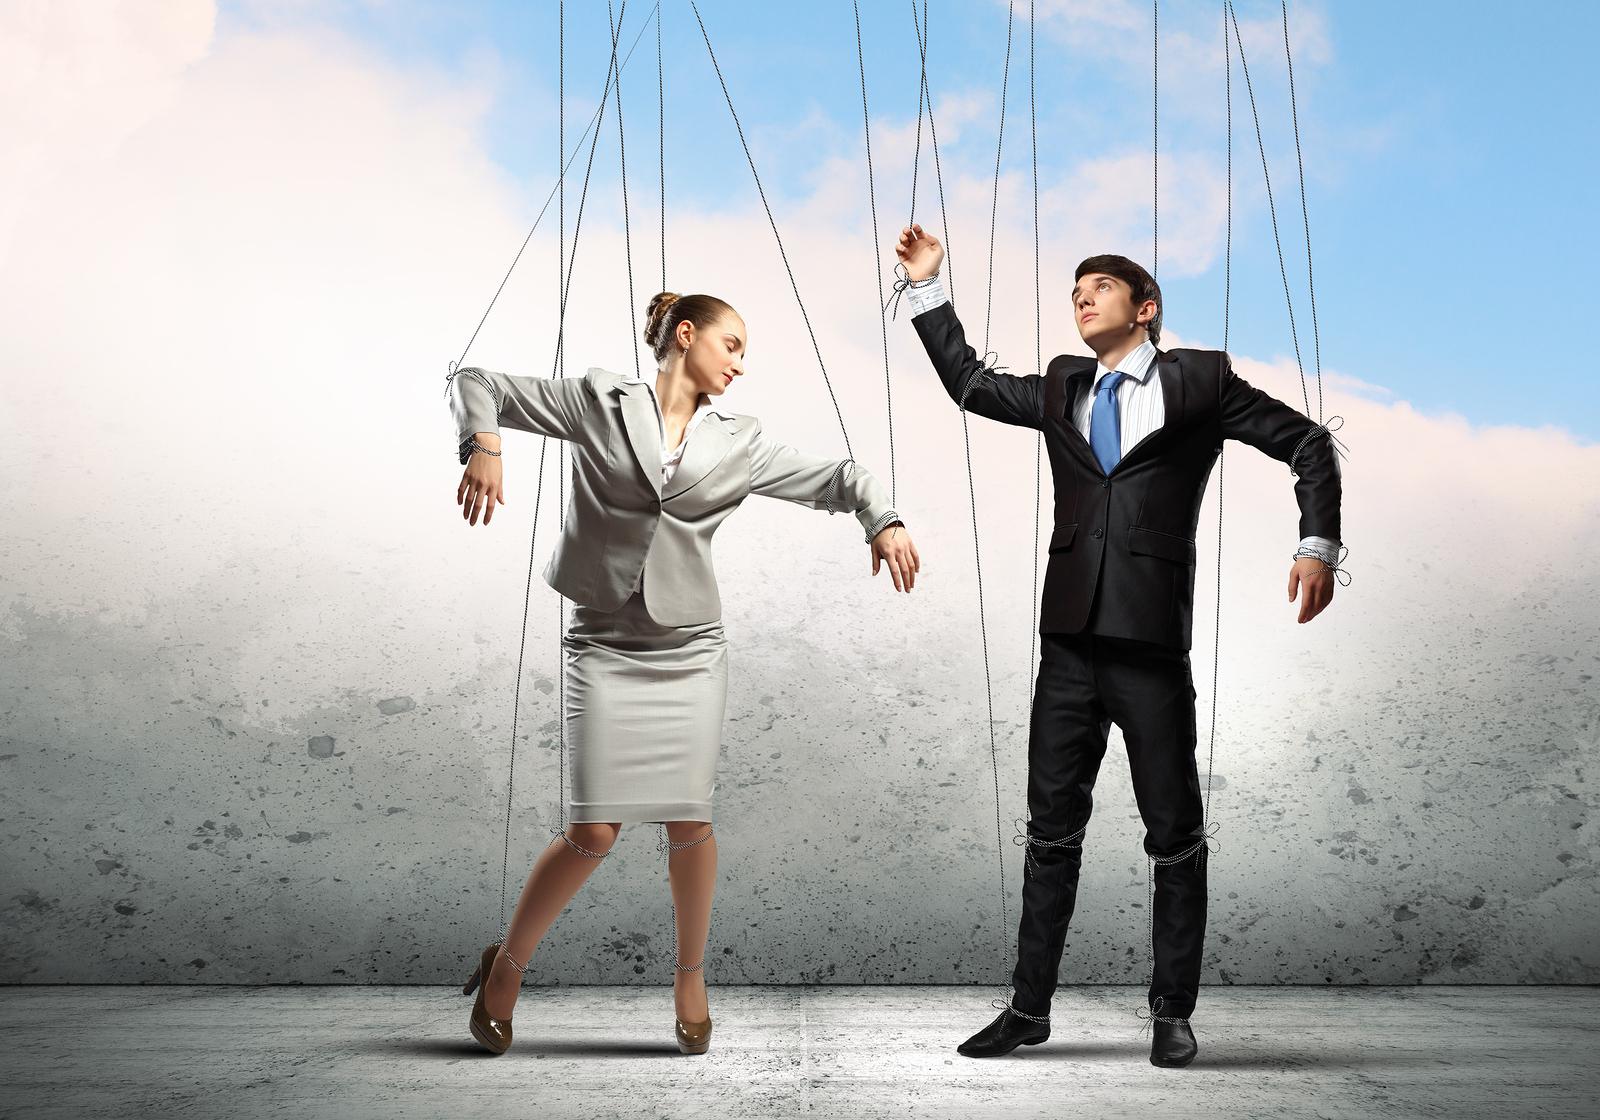 Bigstock image of businesspeople hangin 49602065